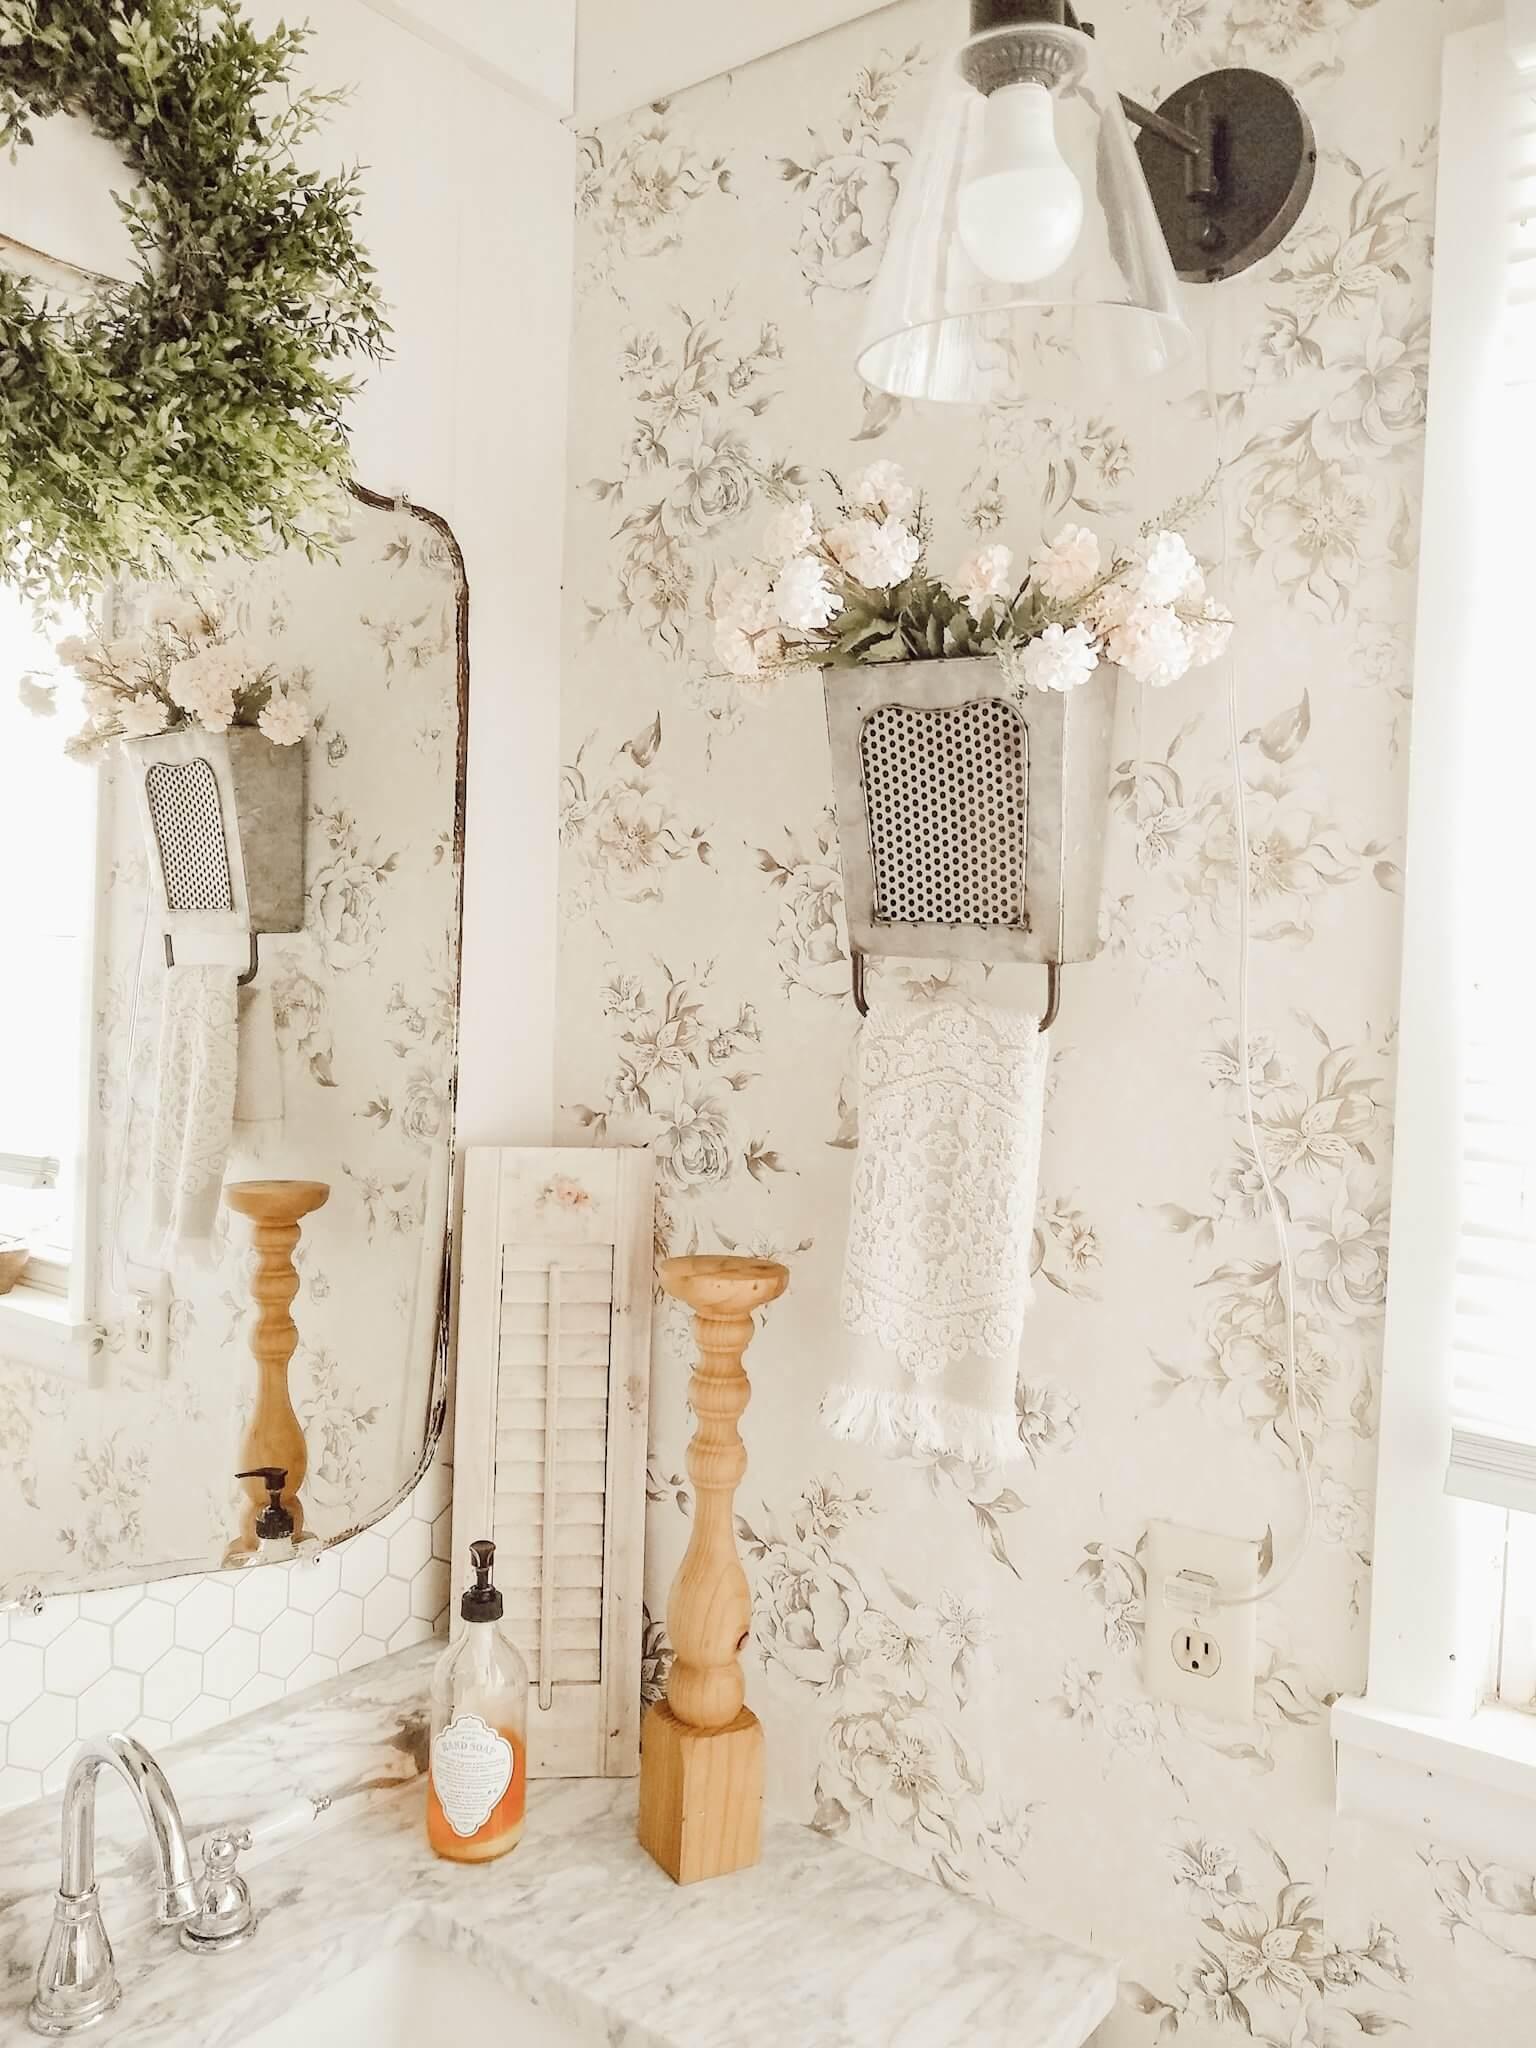 Farmhouse Theme Flower Vase and Towel Rack